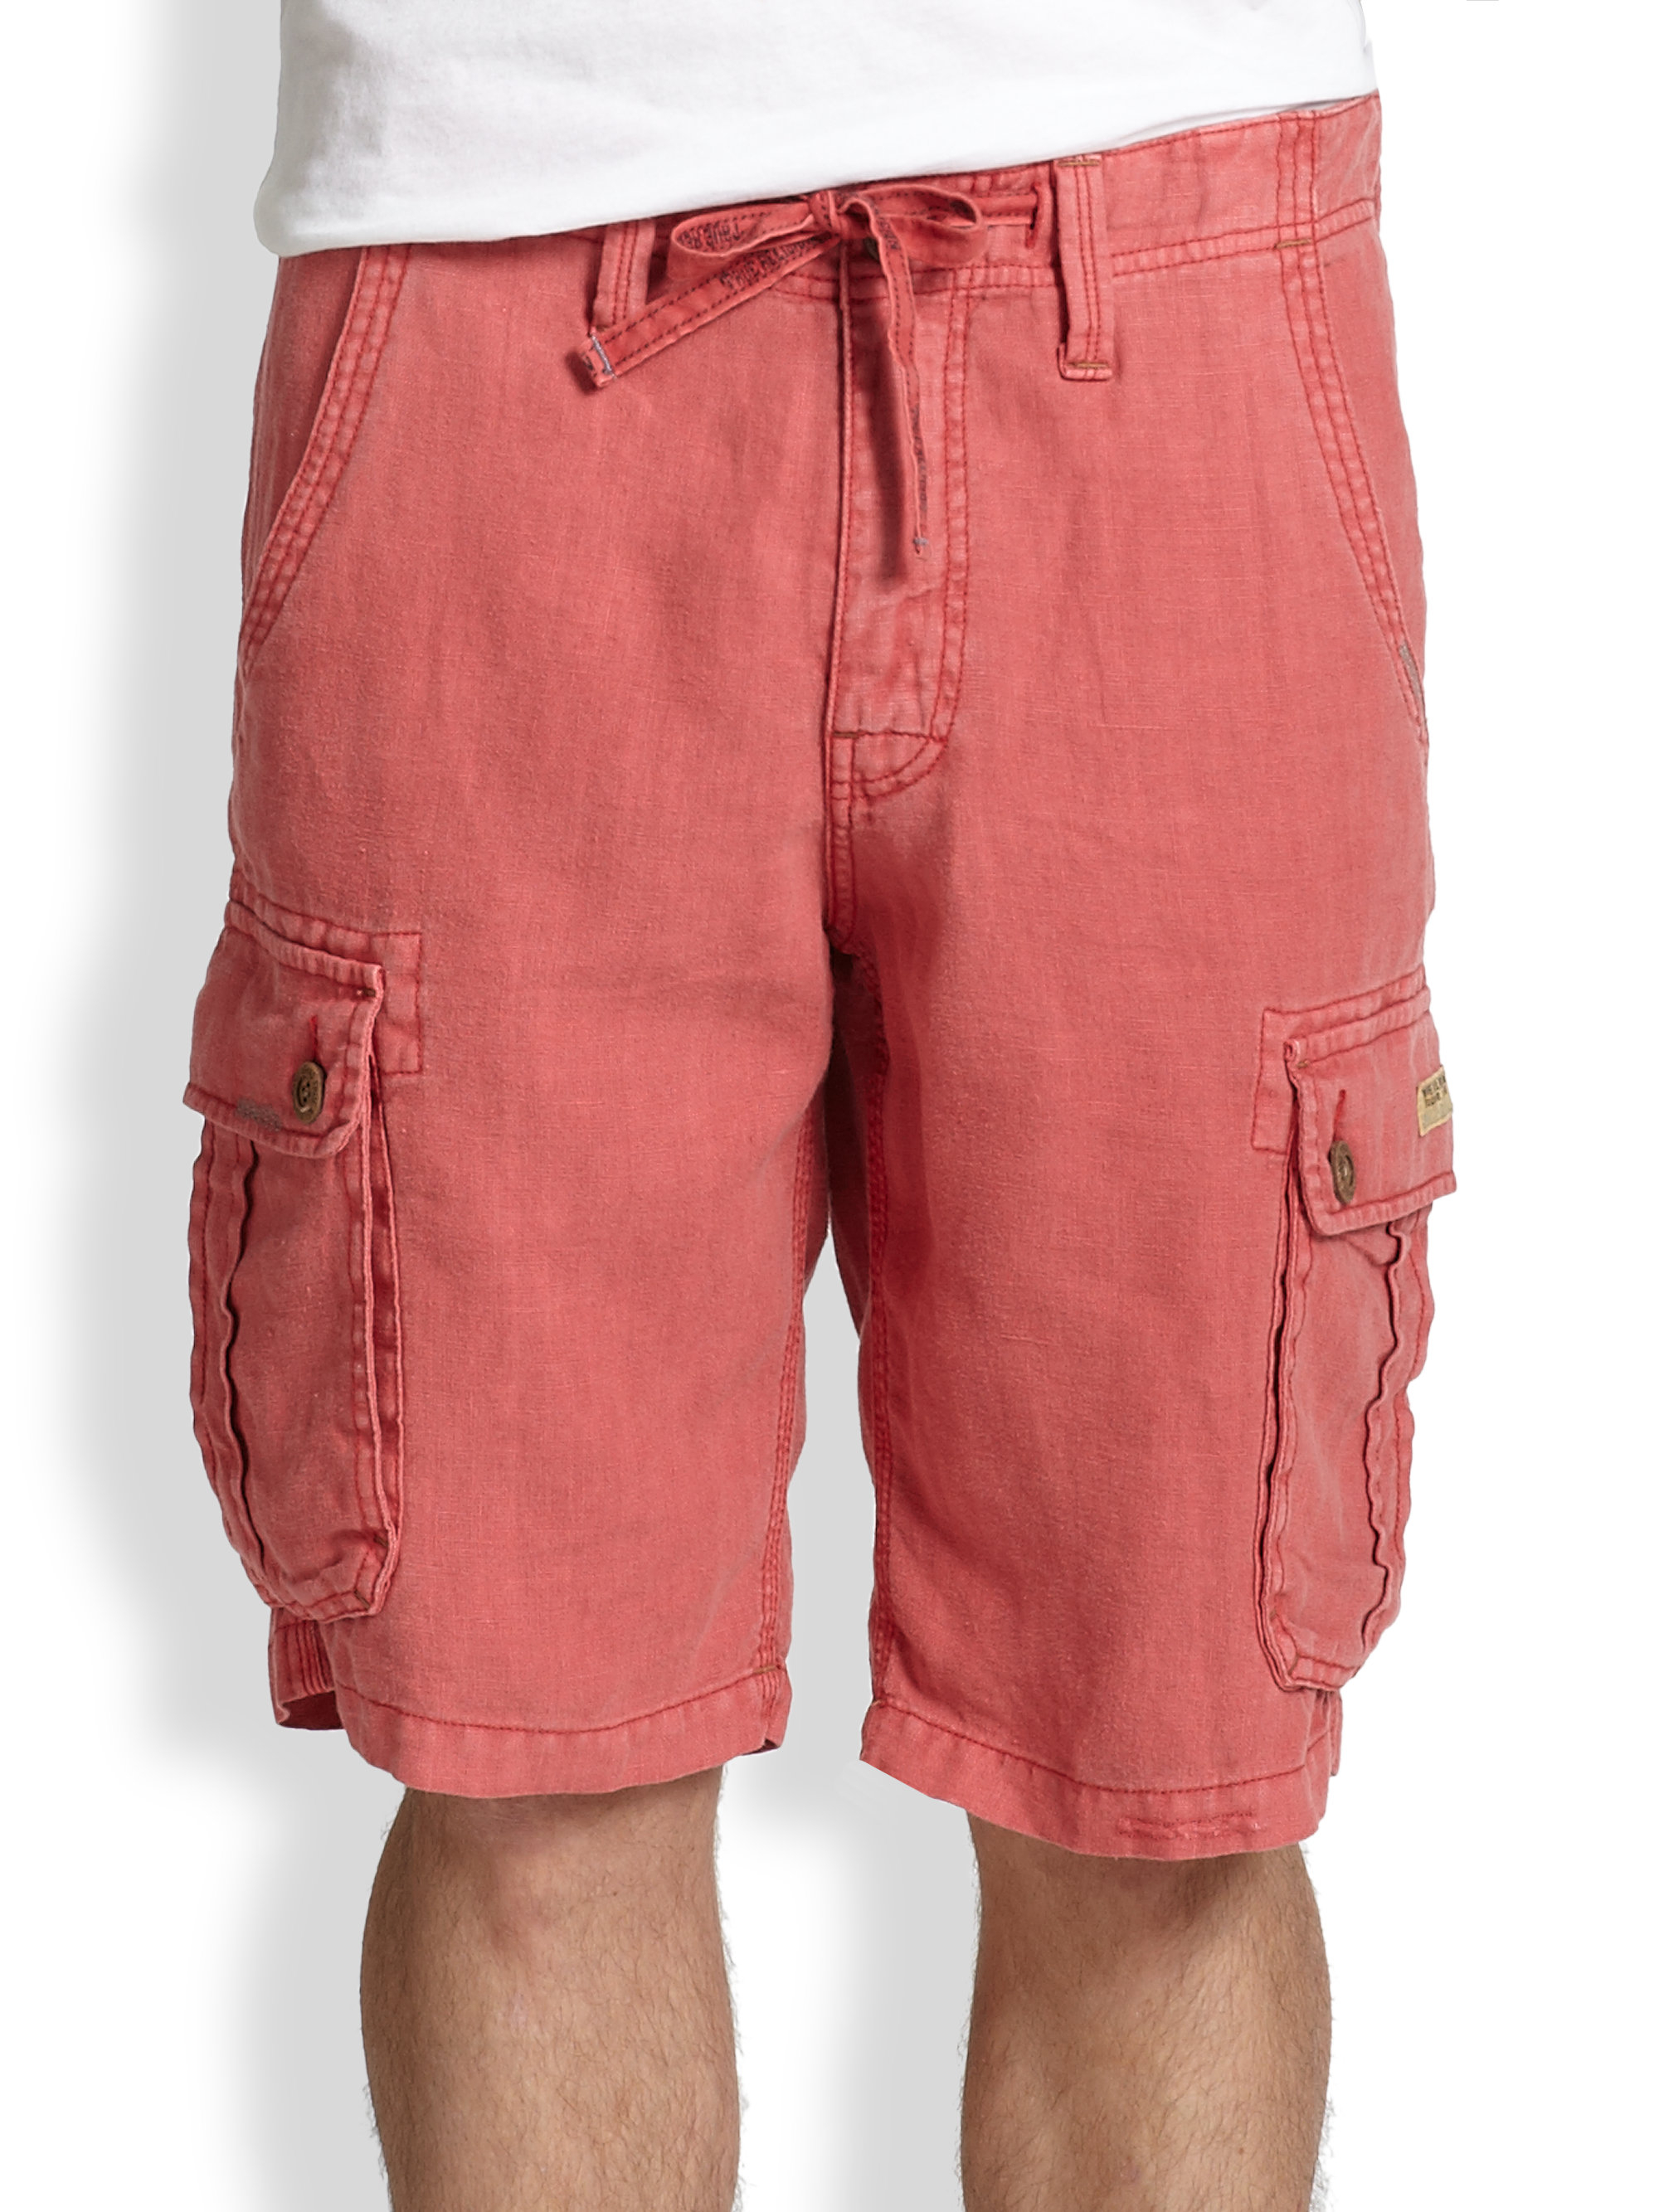 c4dfe57c88 True Religion Recon Cargo Shorts in Pink for Men - Lyst